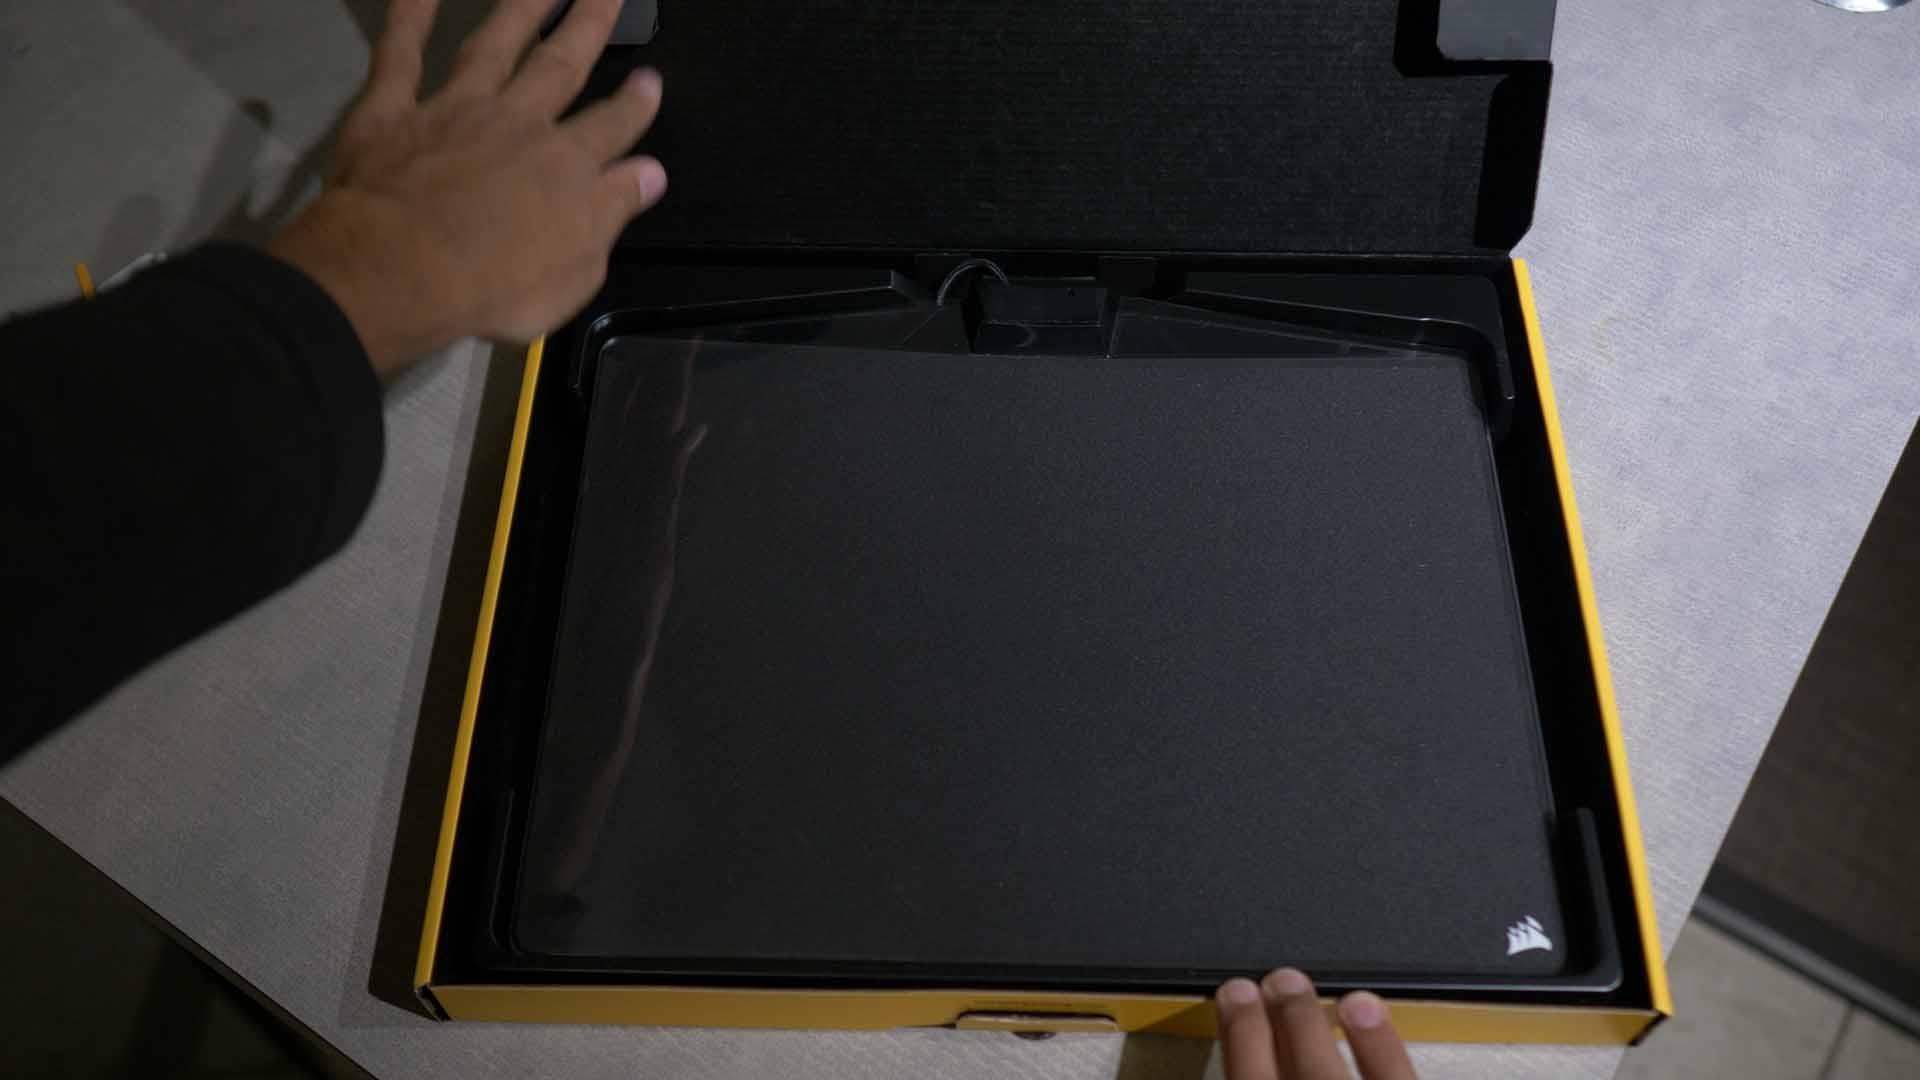 Unboxing Corsair 800C 2 unsmushed - Corsair MM800C Mousepad Review - RGB Overload?